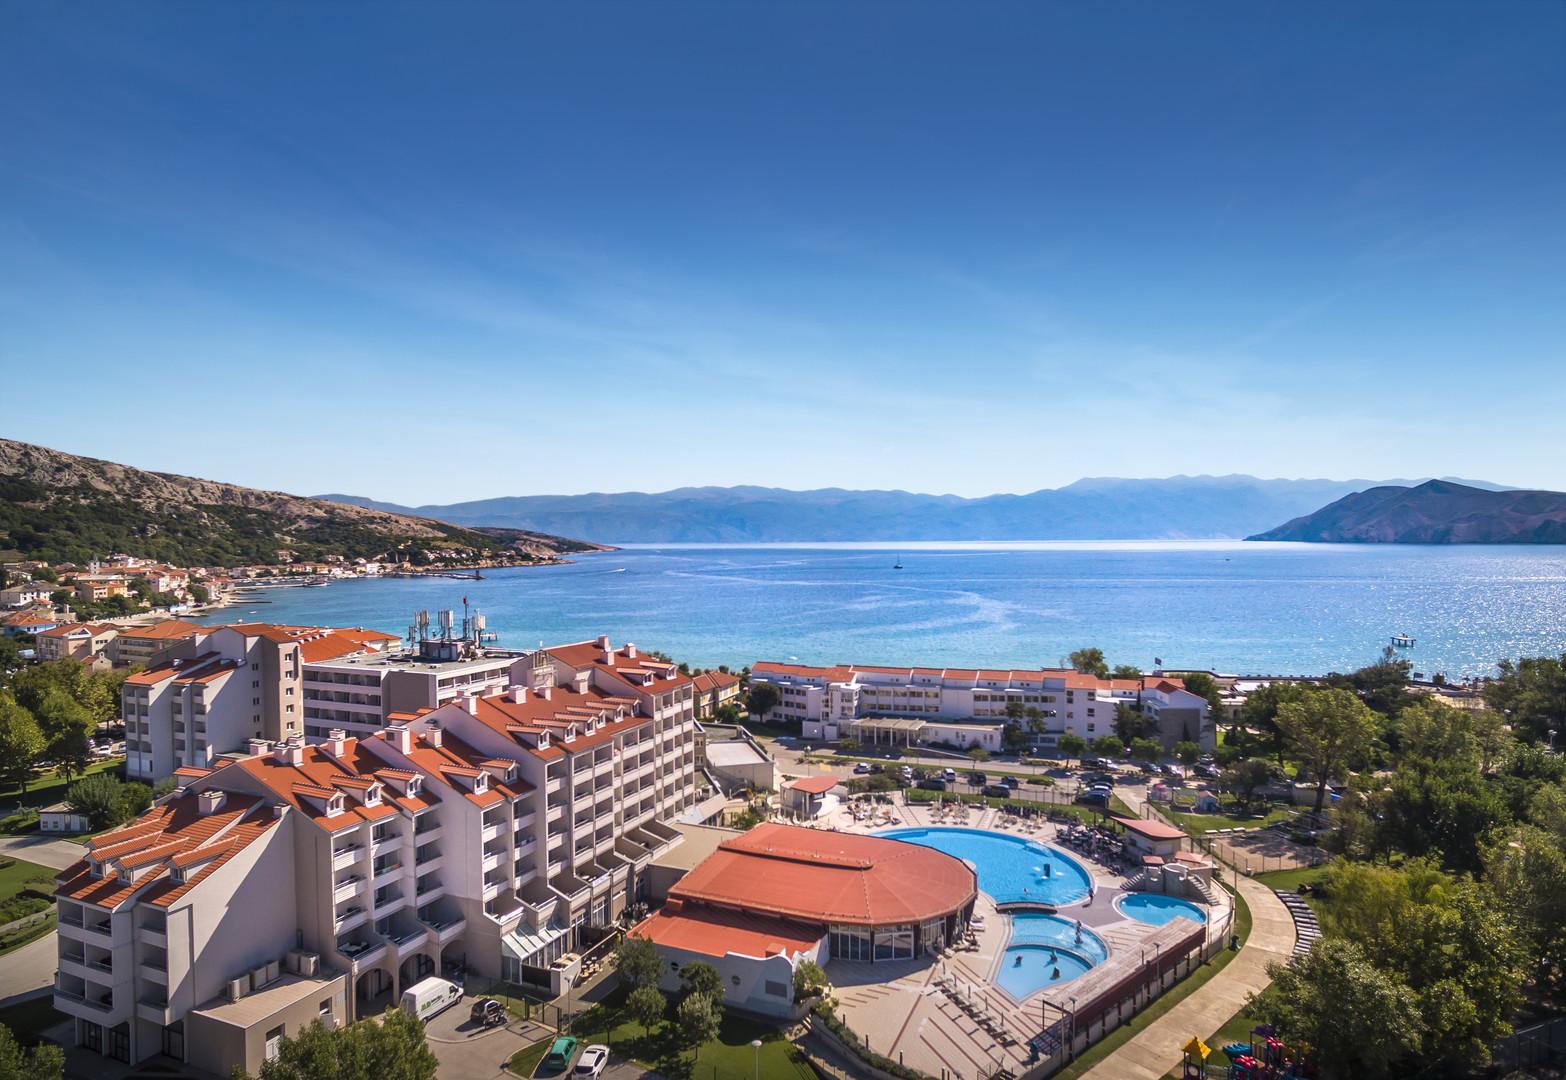 Corinthia Baška Sunny Hotel by Valamar #2